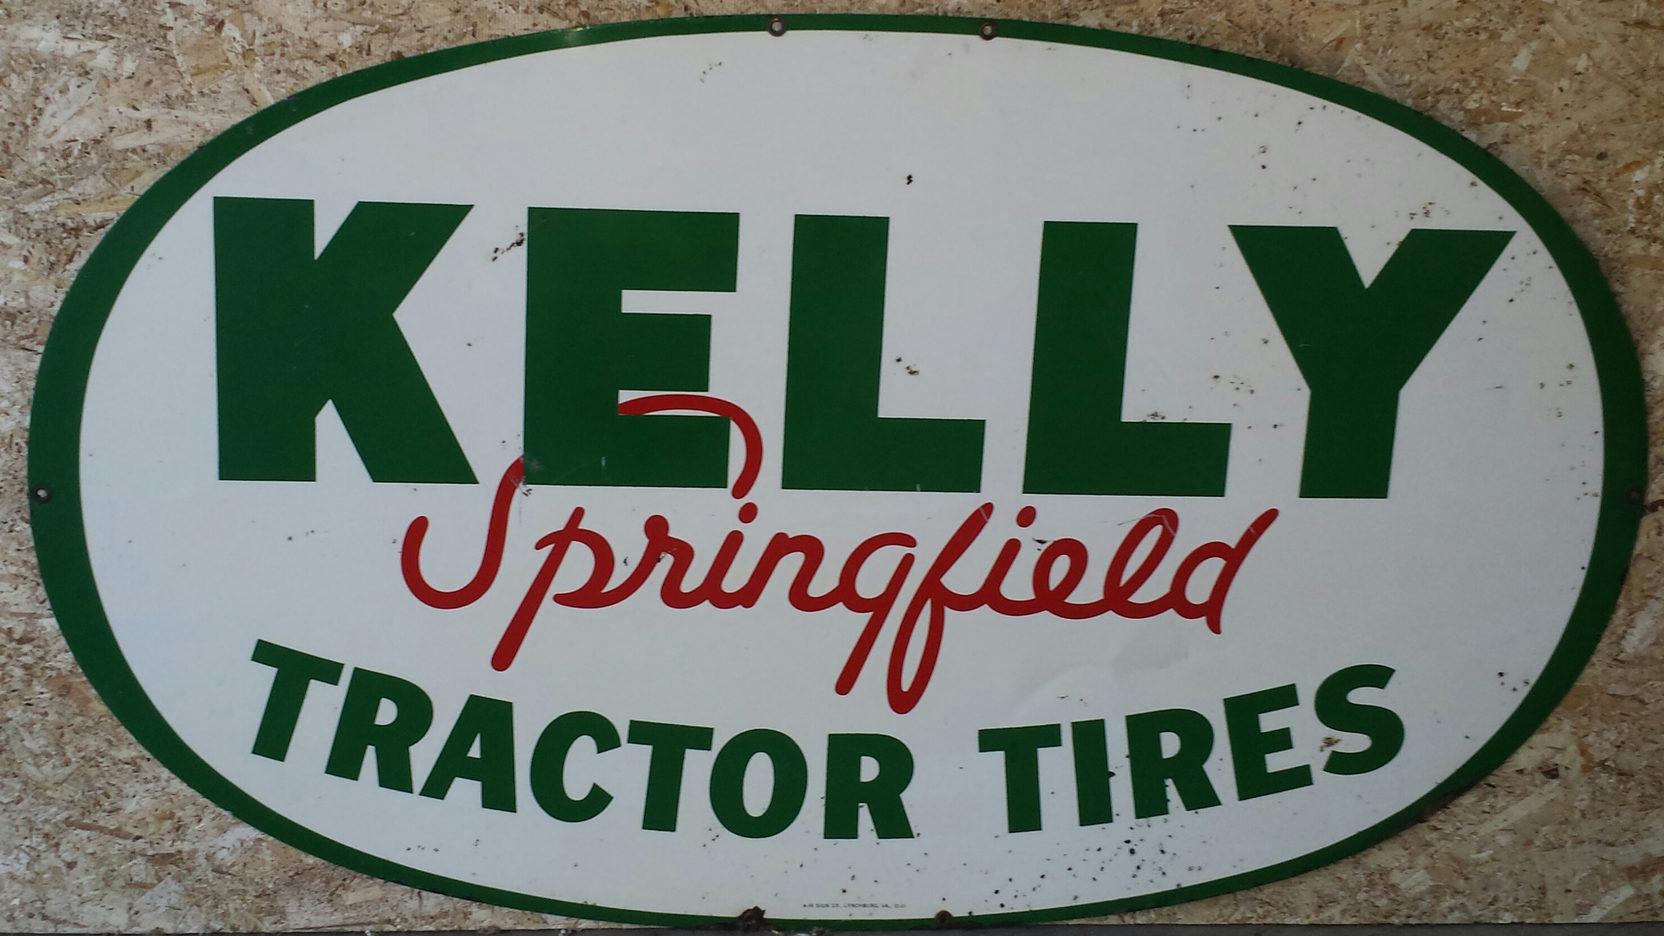 Kelly Springfield Jobs - Year of Clean Water